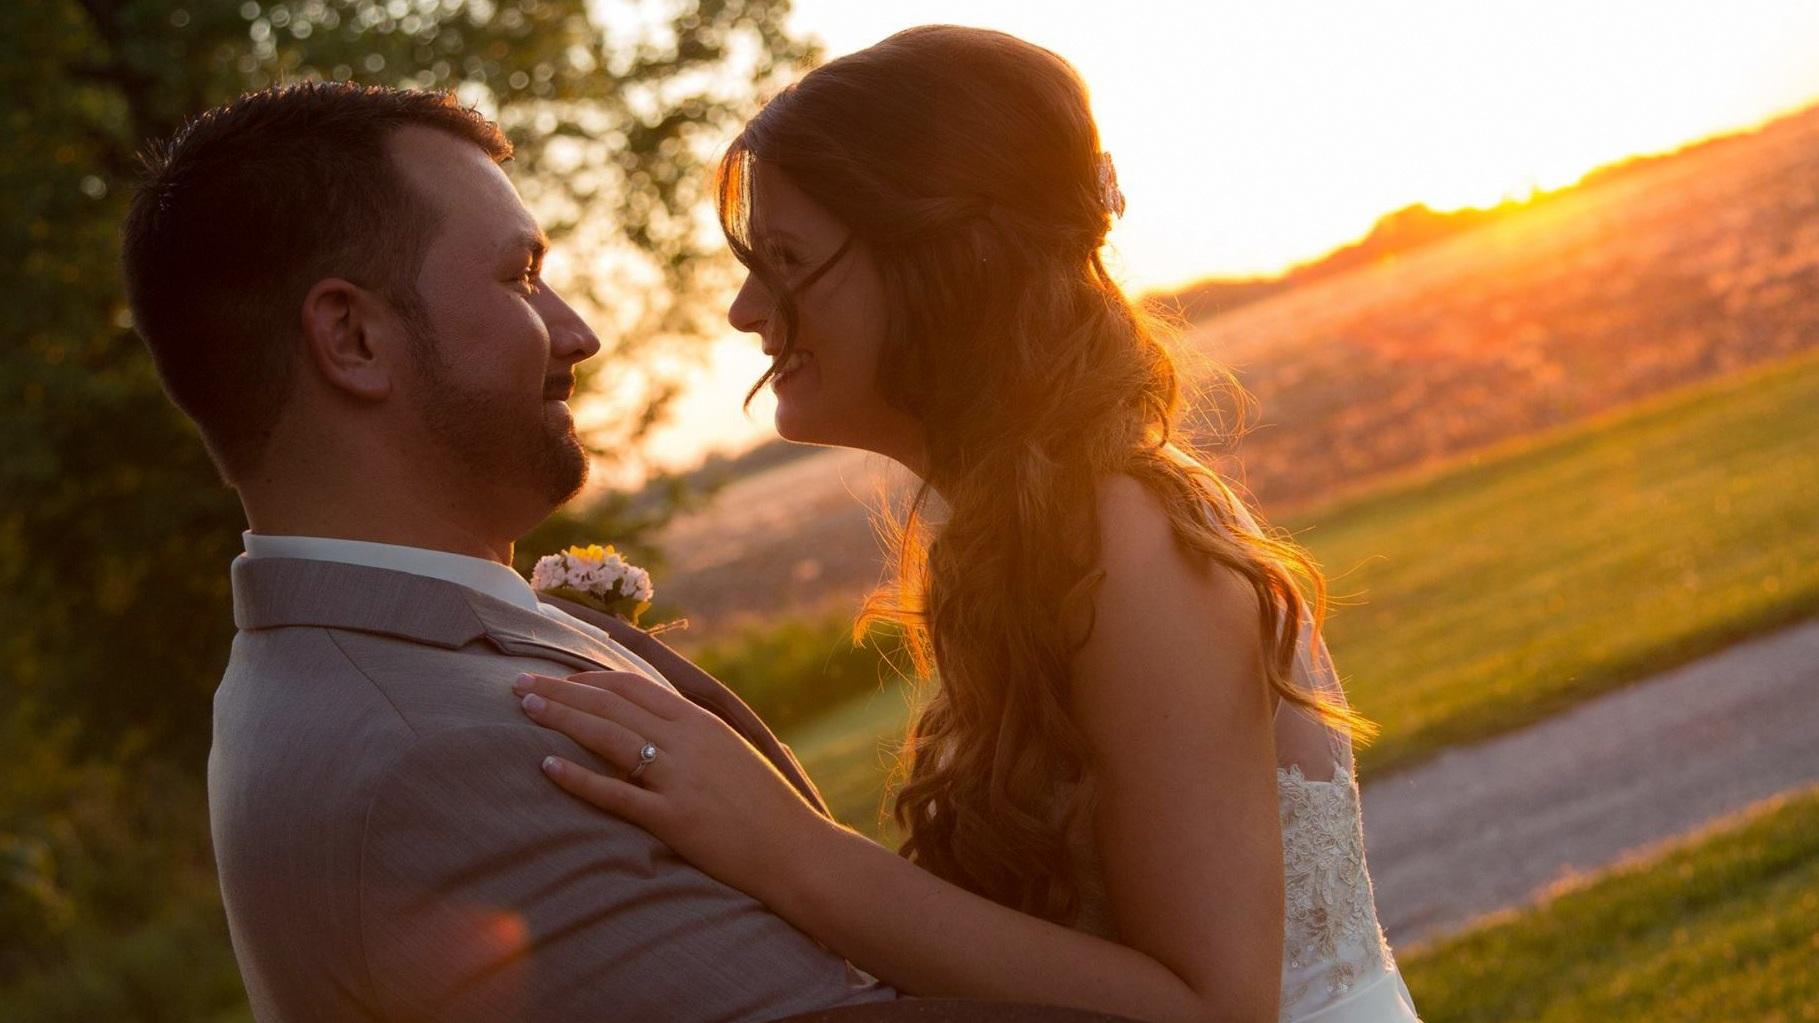 Brandon & Jessica - Married 5 / 13 / 2017